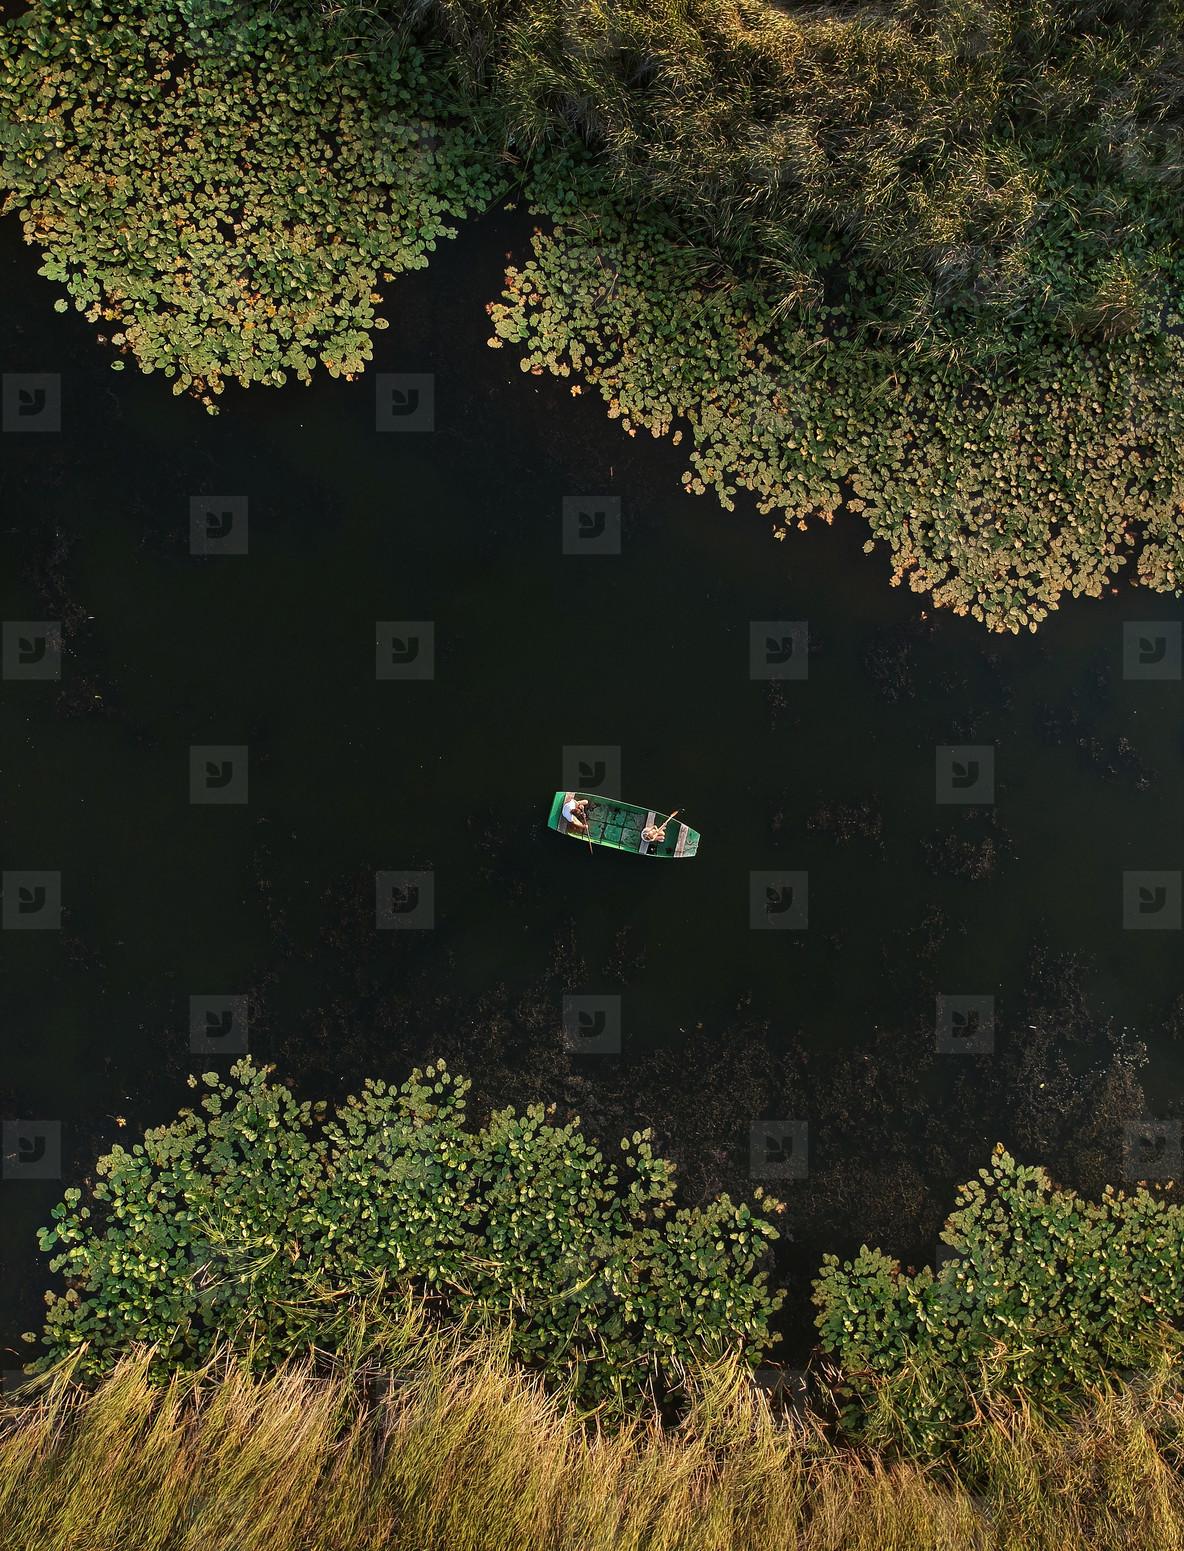 ZASAVICA  SERBIA   A small boat floats on the Zasavica River in Serbia